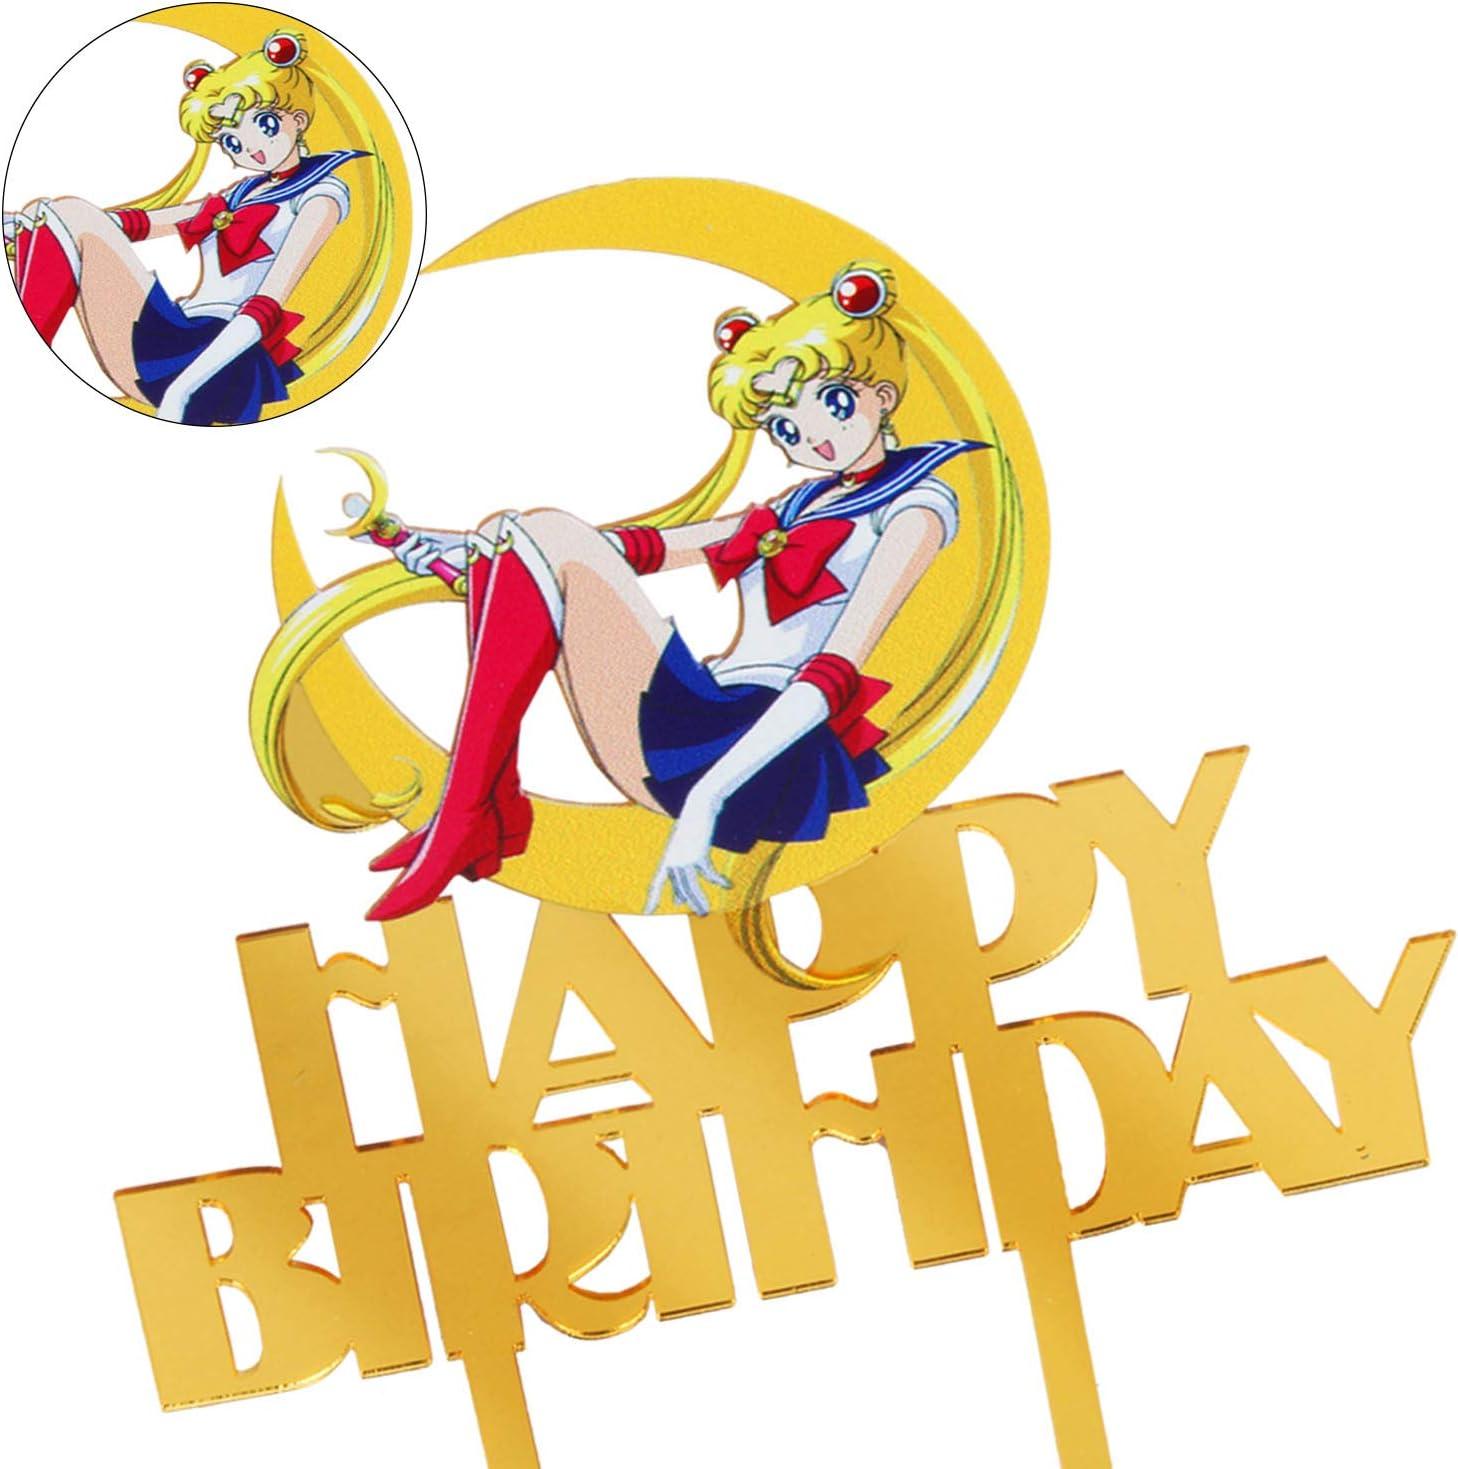 LILIPARTY Cartoon Acrylic Sailor Moon Happy Birthday Cake Topper Pretty Guardian Theme Birthday Party Decoration Suppliers Girls Birthday Favors